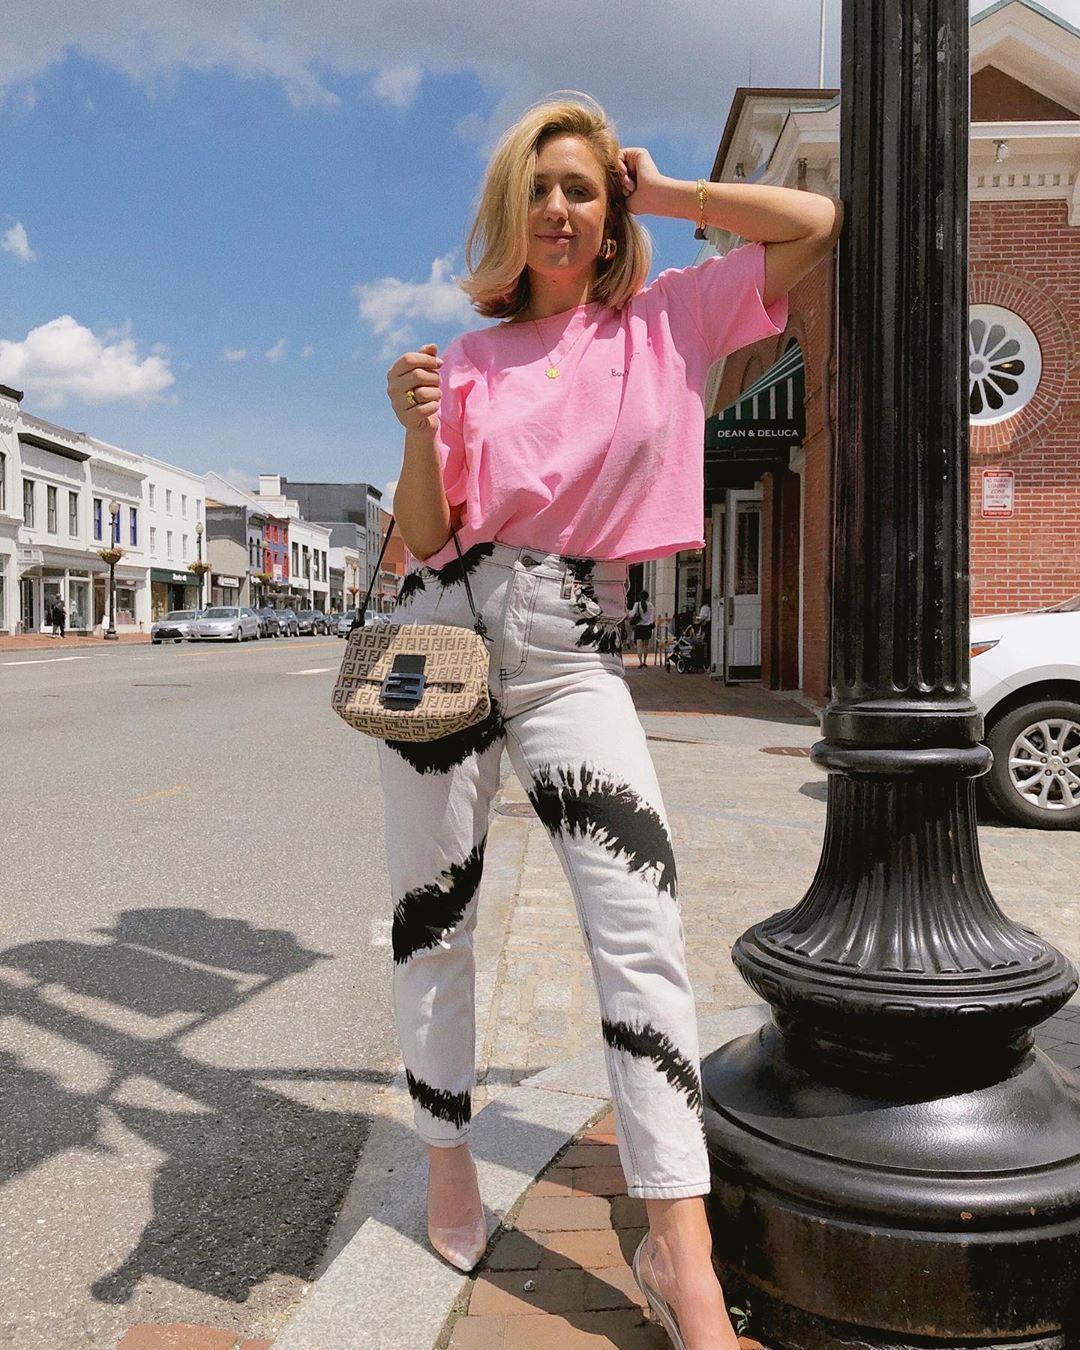 Jeans, $80 at m.us.topshop.com – Wheretoget